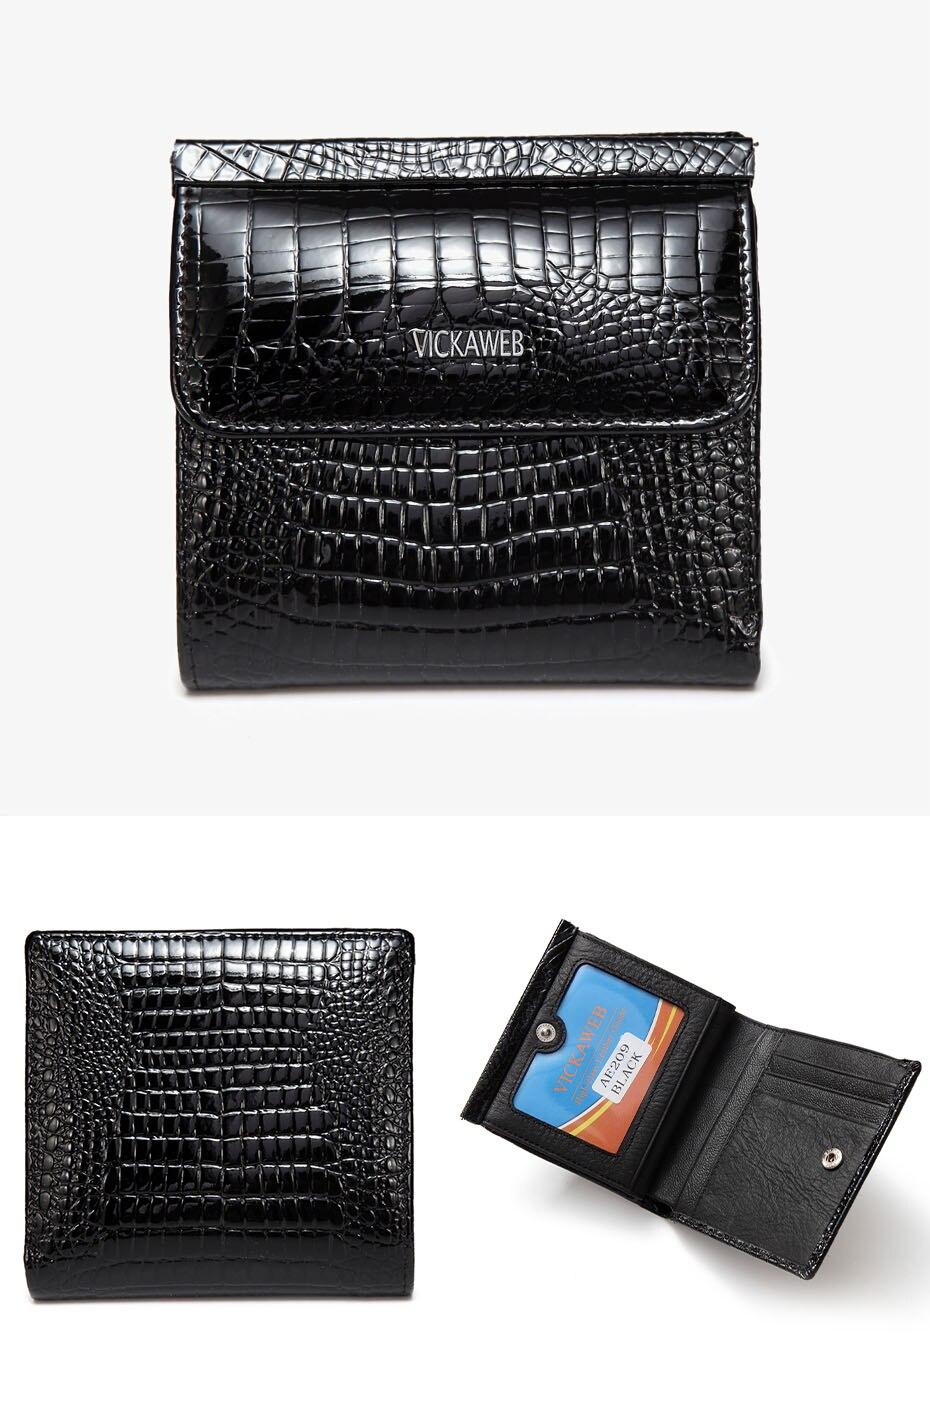 VICKAWEB Mini Wallet Women Genuine Leather Wallets Fashion Alligator Hasp Short Wallet Female Small Woman Wallets And Purses-AE209-018